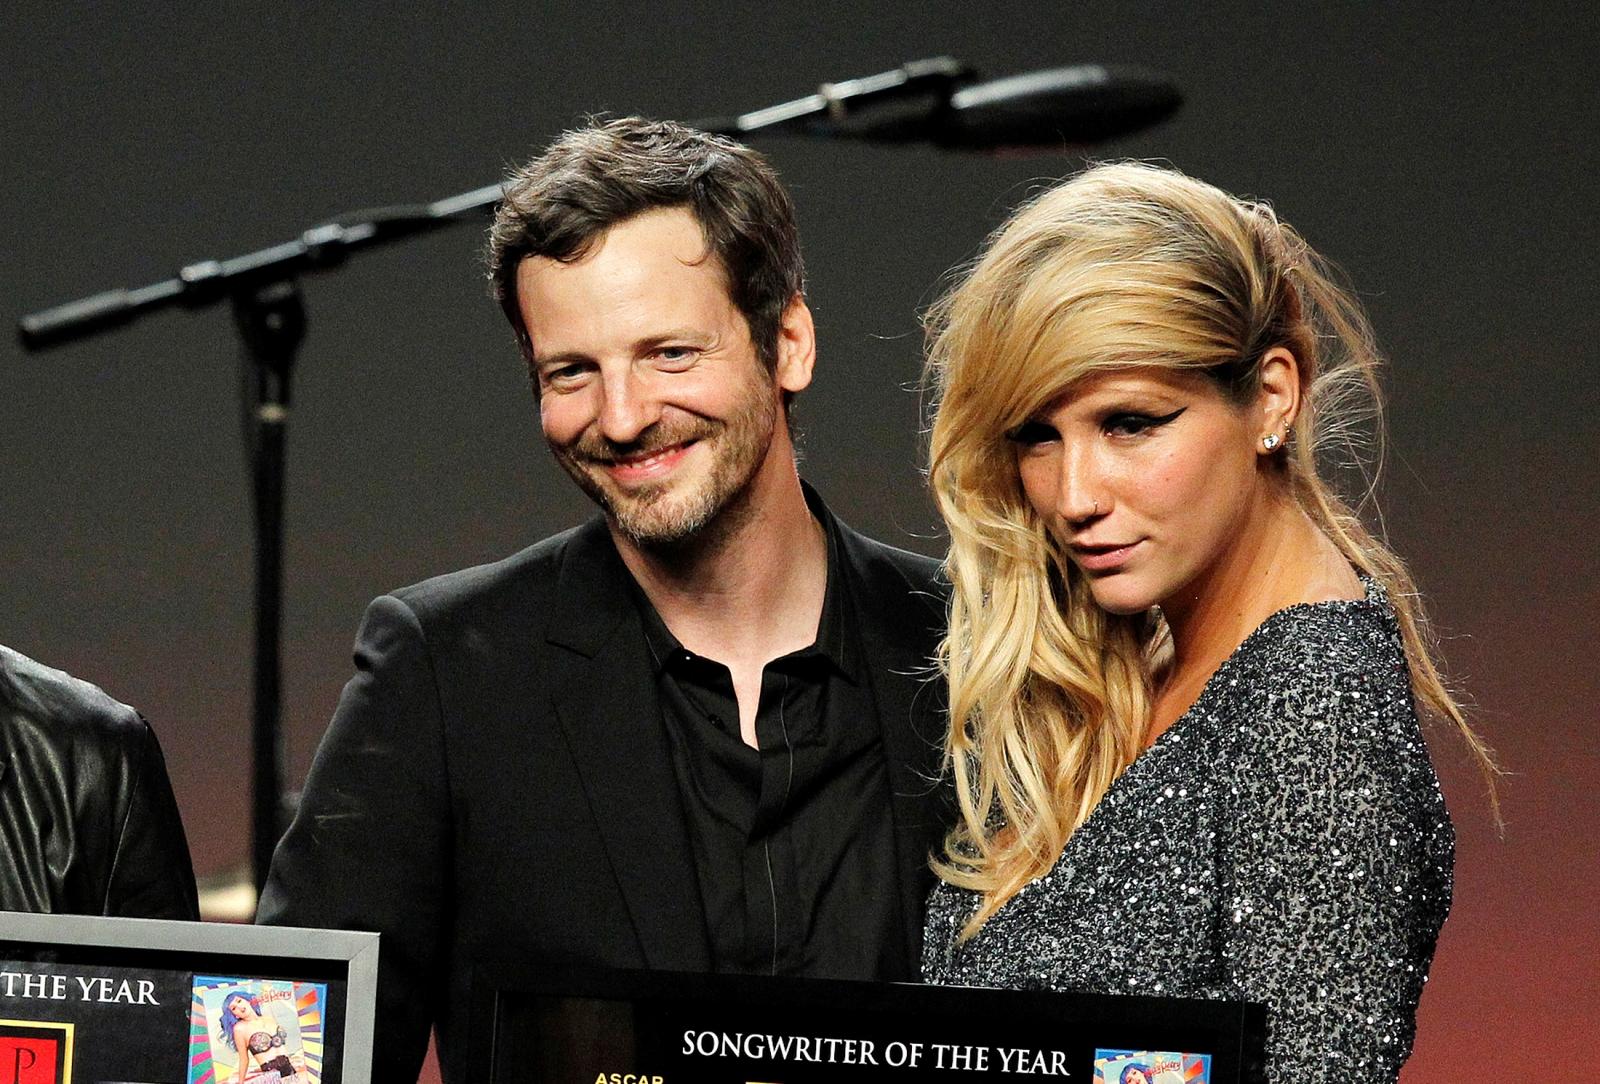 Dr Luke and Kesha